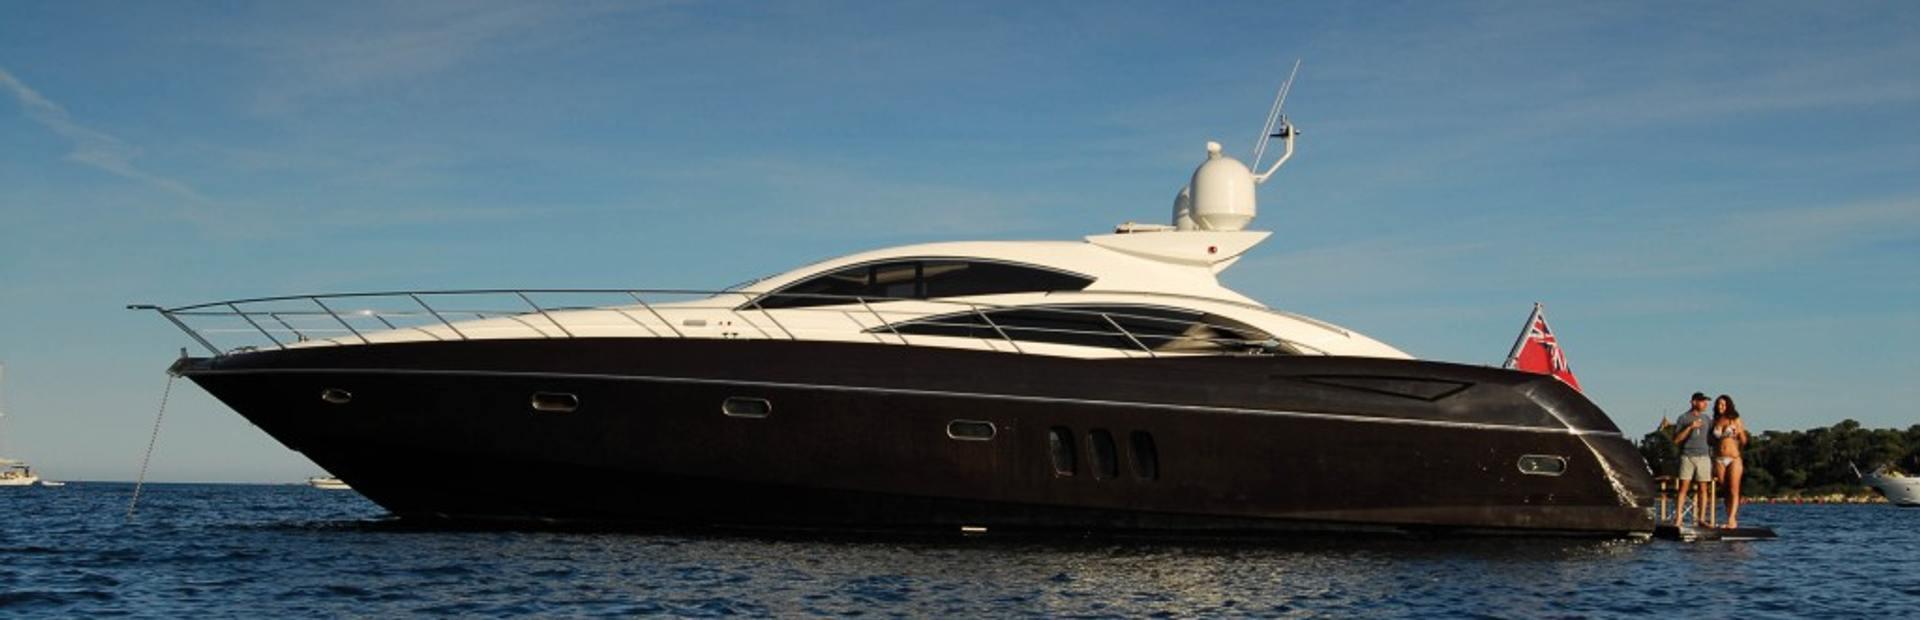 Predator 72 Yacht Charter